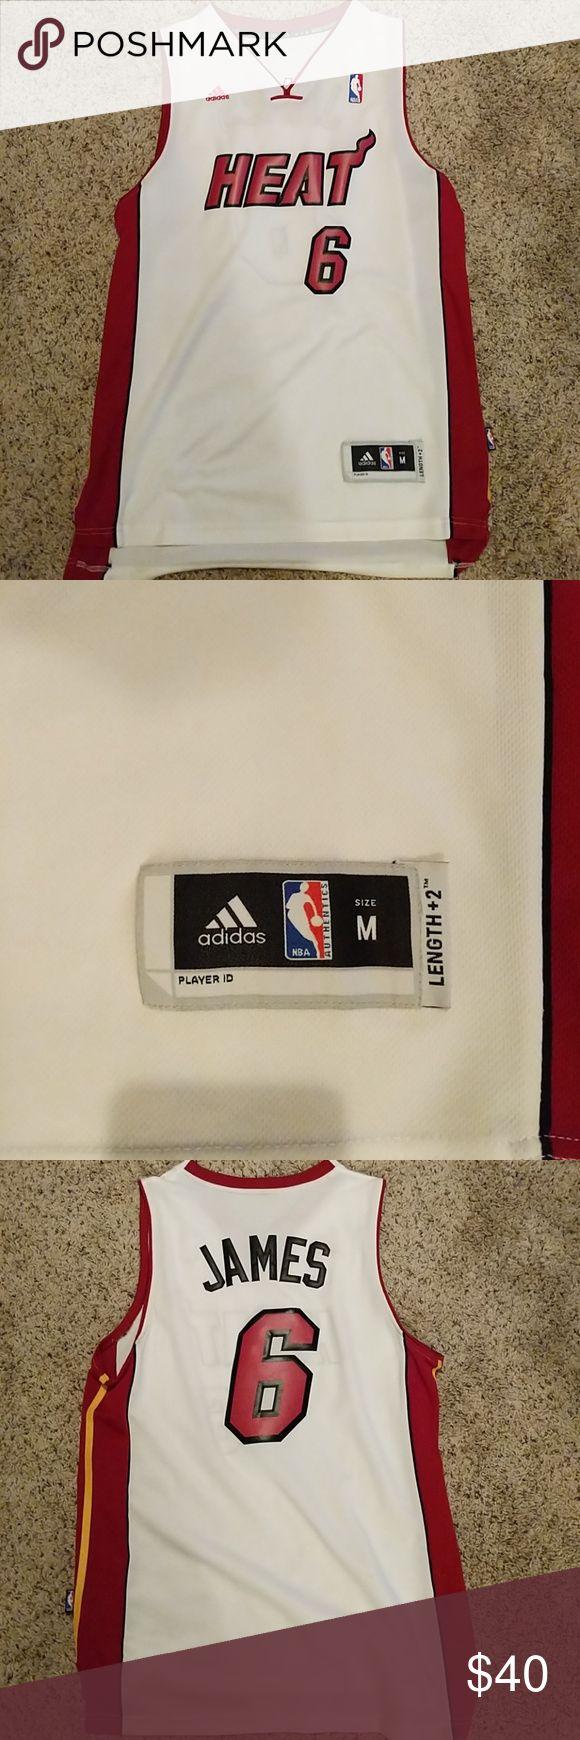 Lebron James Heat Jersey Mens medium Perfect condition Lebron James Basketball Jersey adidas Other